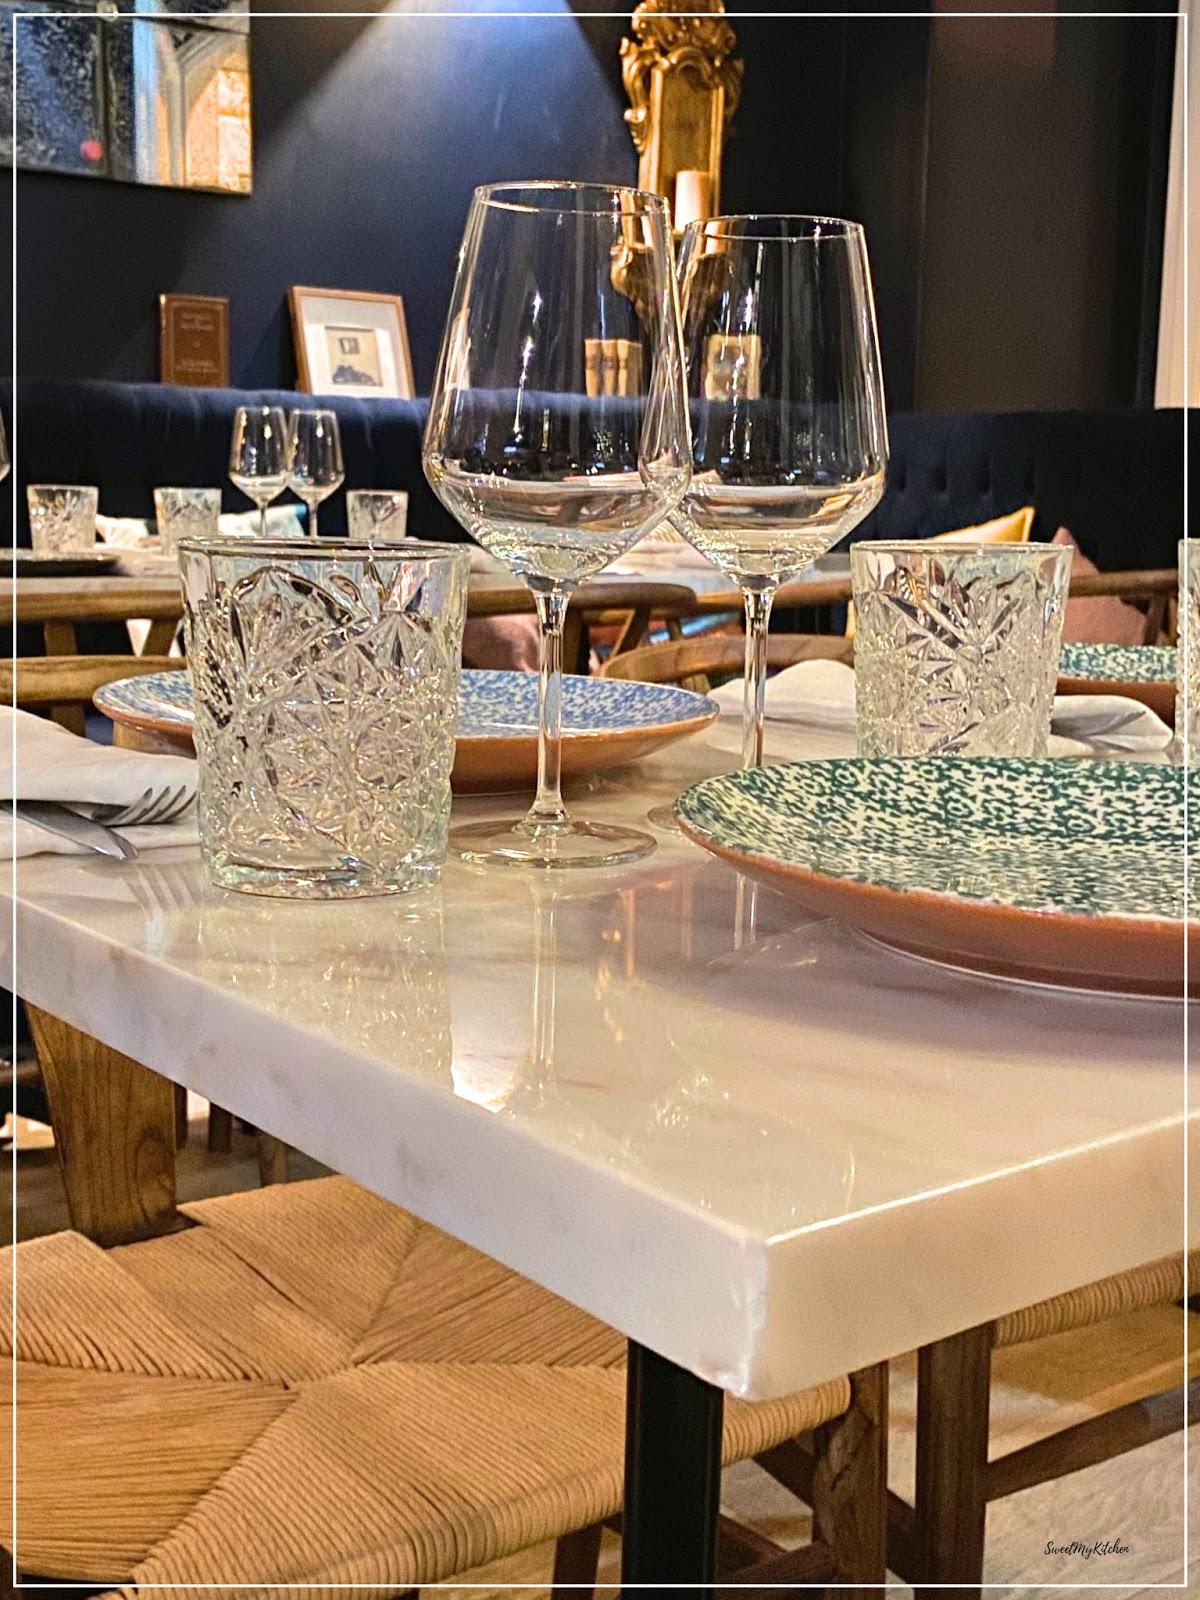 Visconti Chiado restaurante italiano